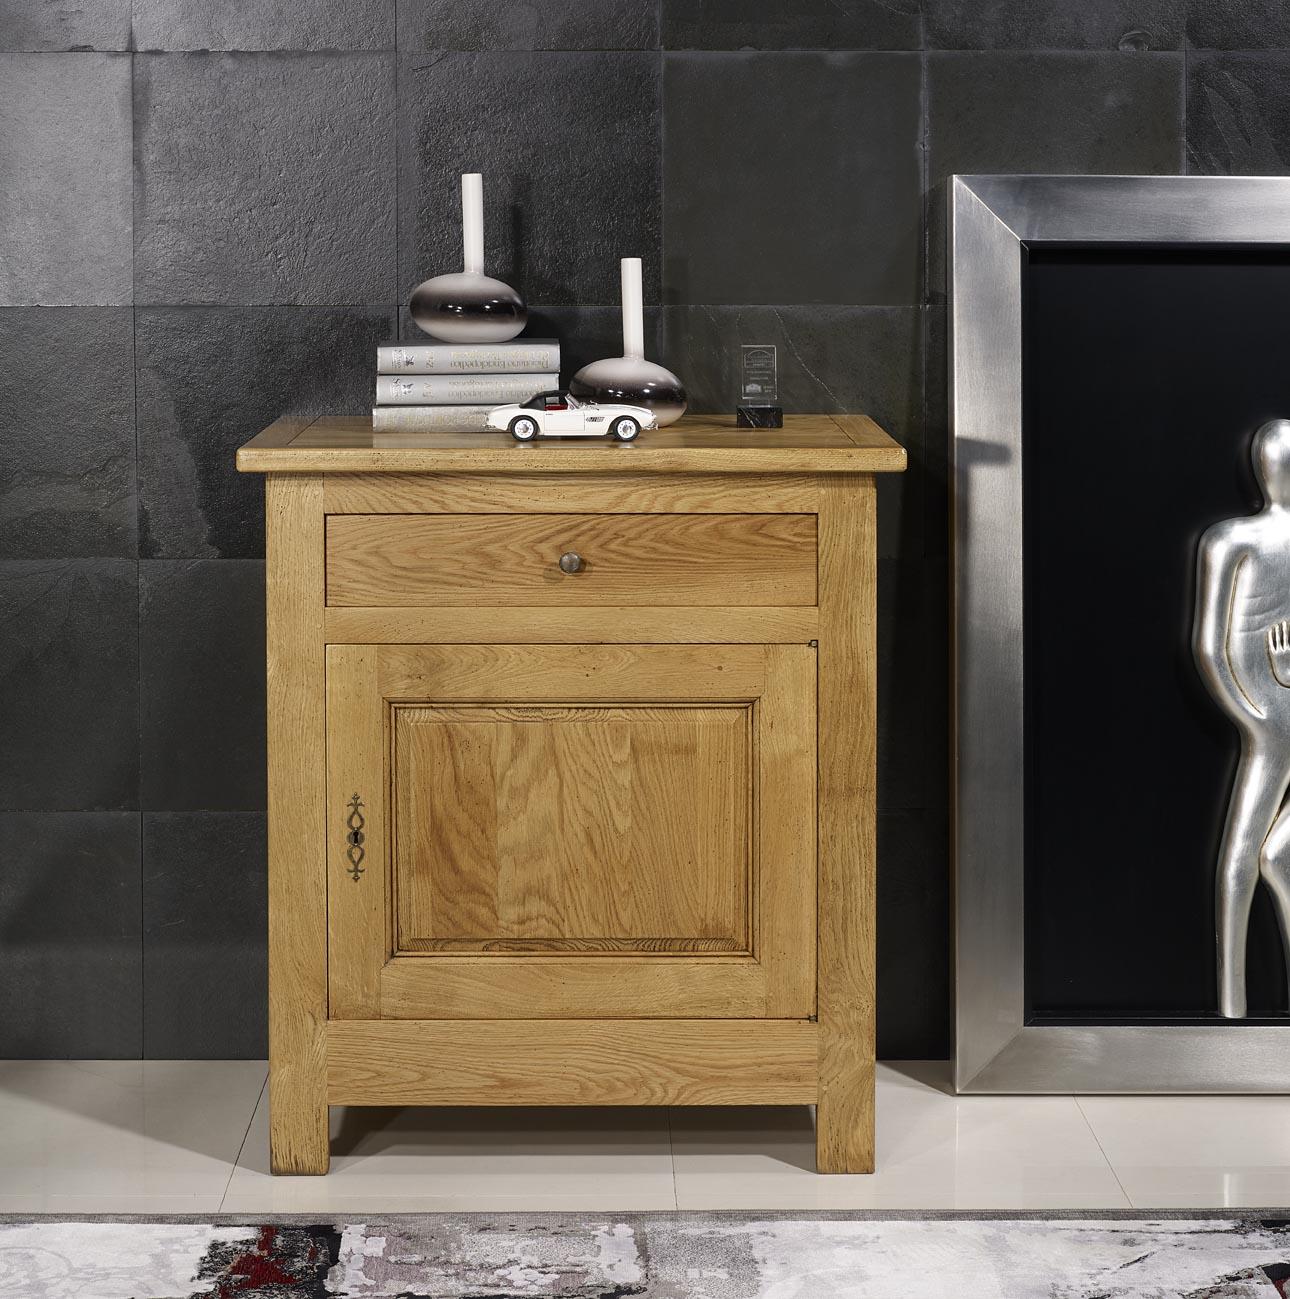 confitutier 1 porte 1 tiroir en ch ne massif de style campagnard 1 seul disponible meuble en ch ne. Black Bedroom Furniture Sets. Home Design Ideas